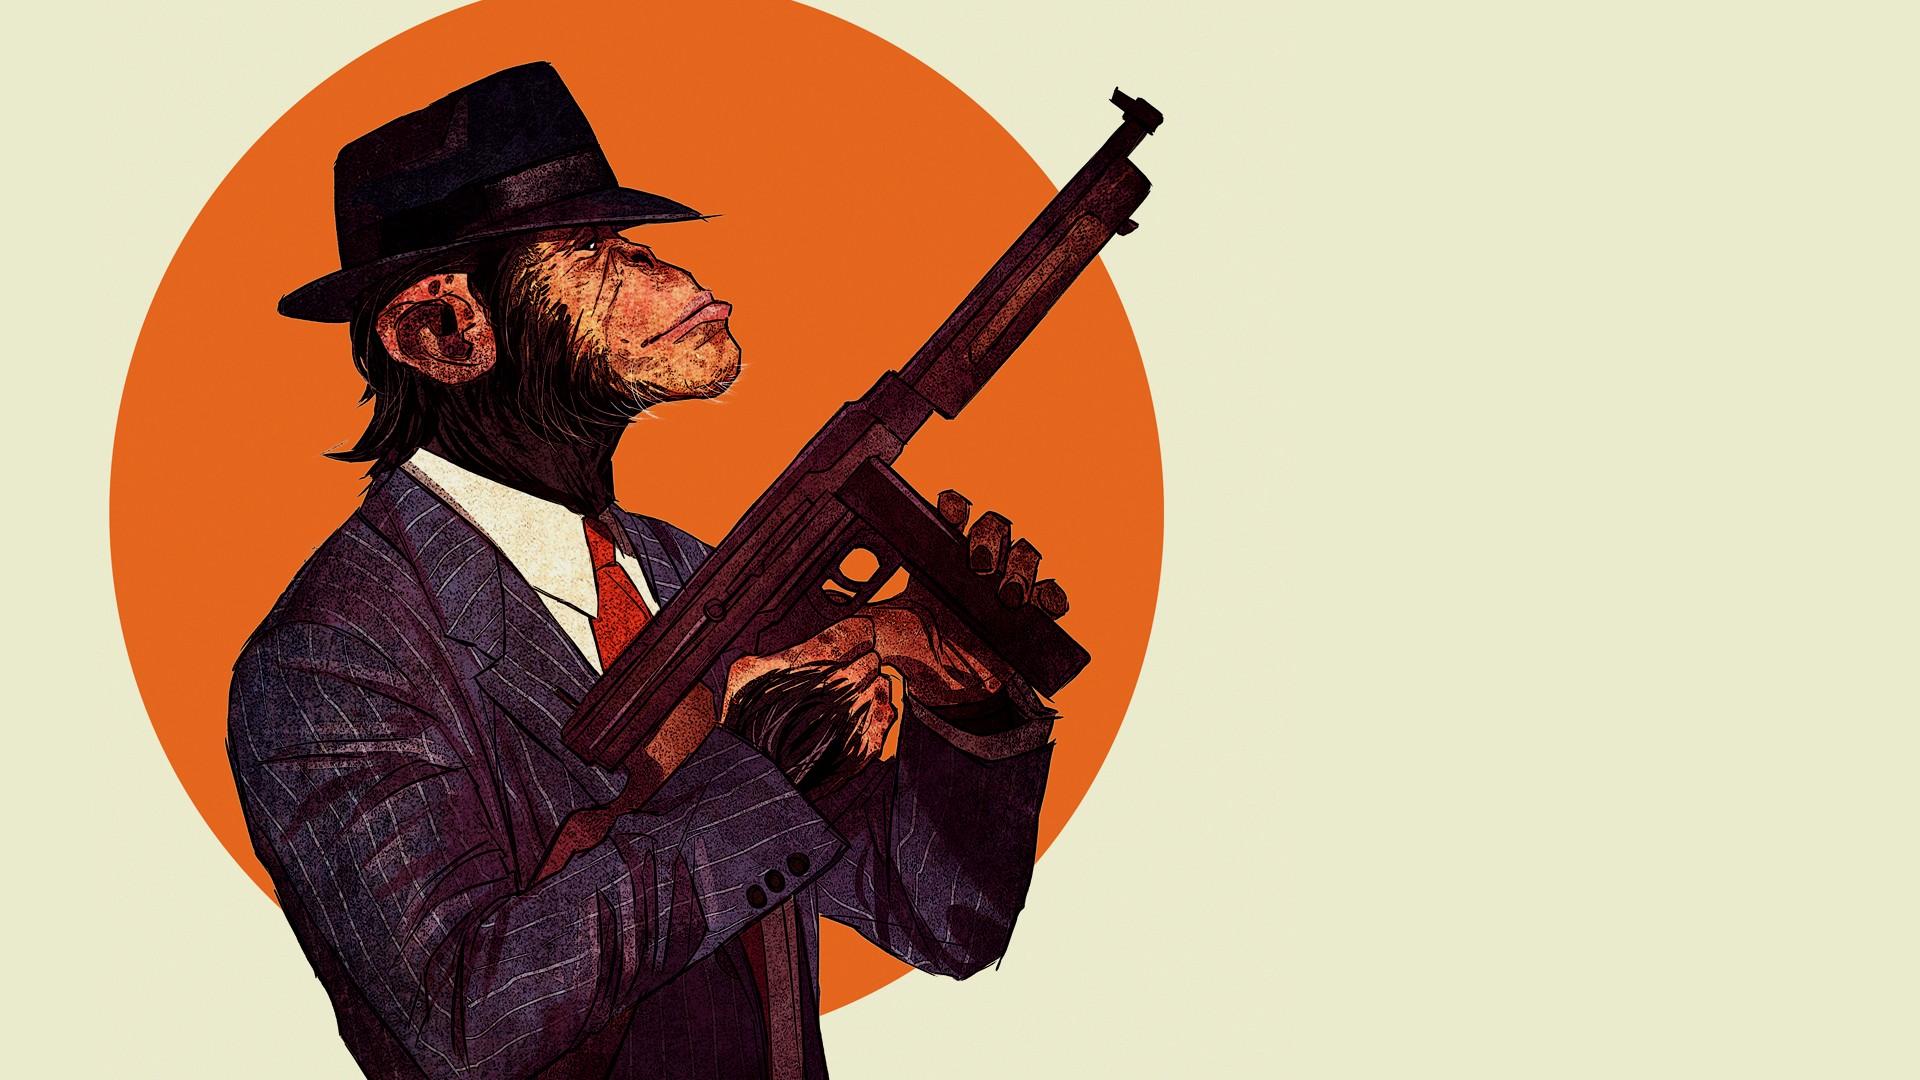 https://get.wallhere.com/photo/illustration-gun-Thompson-chimpanzees-tommy-gun-plucked-string-instruments-115080.jpg